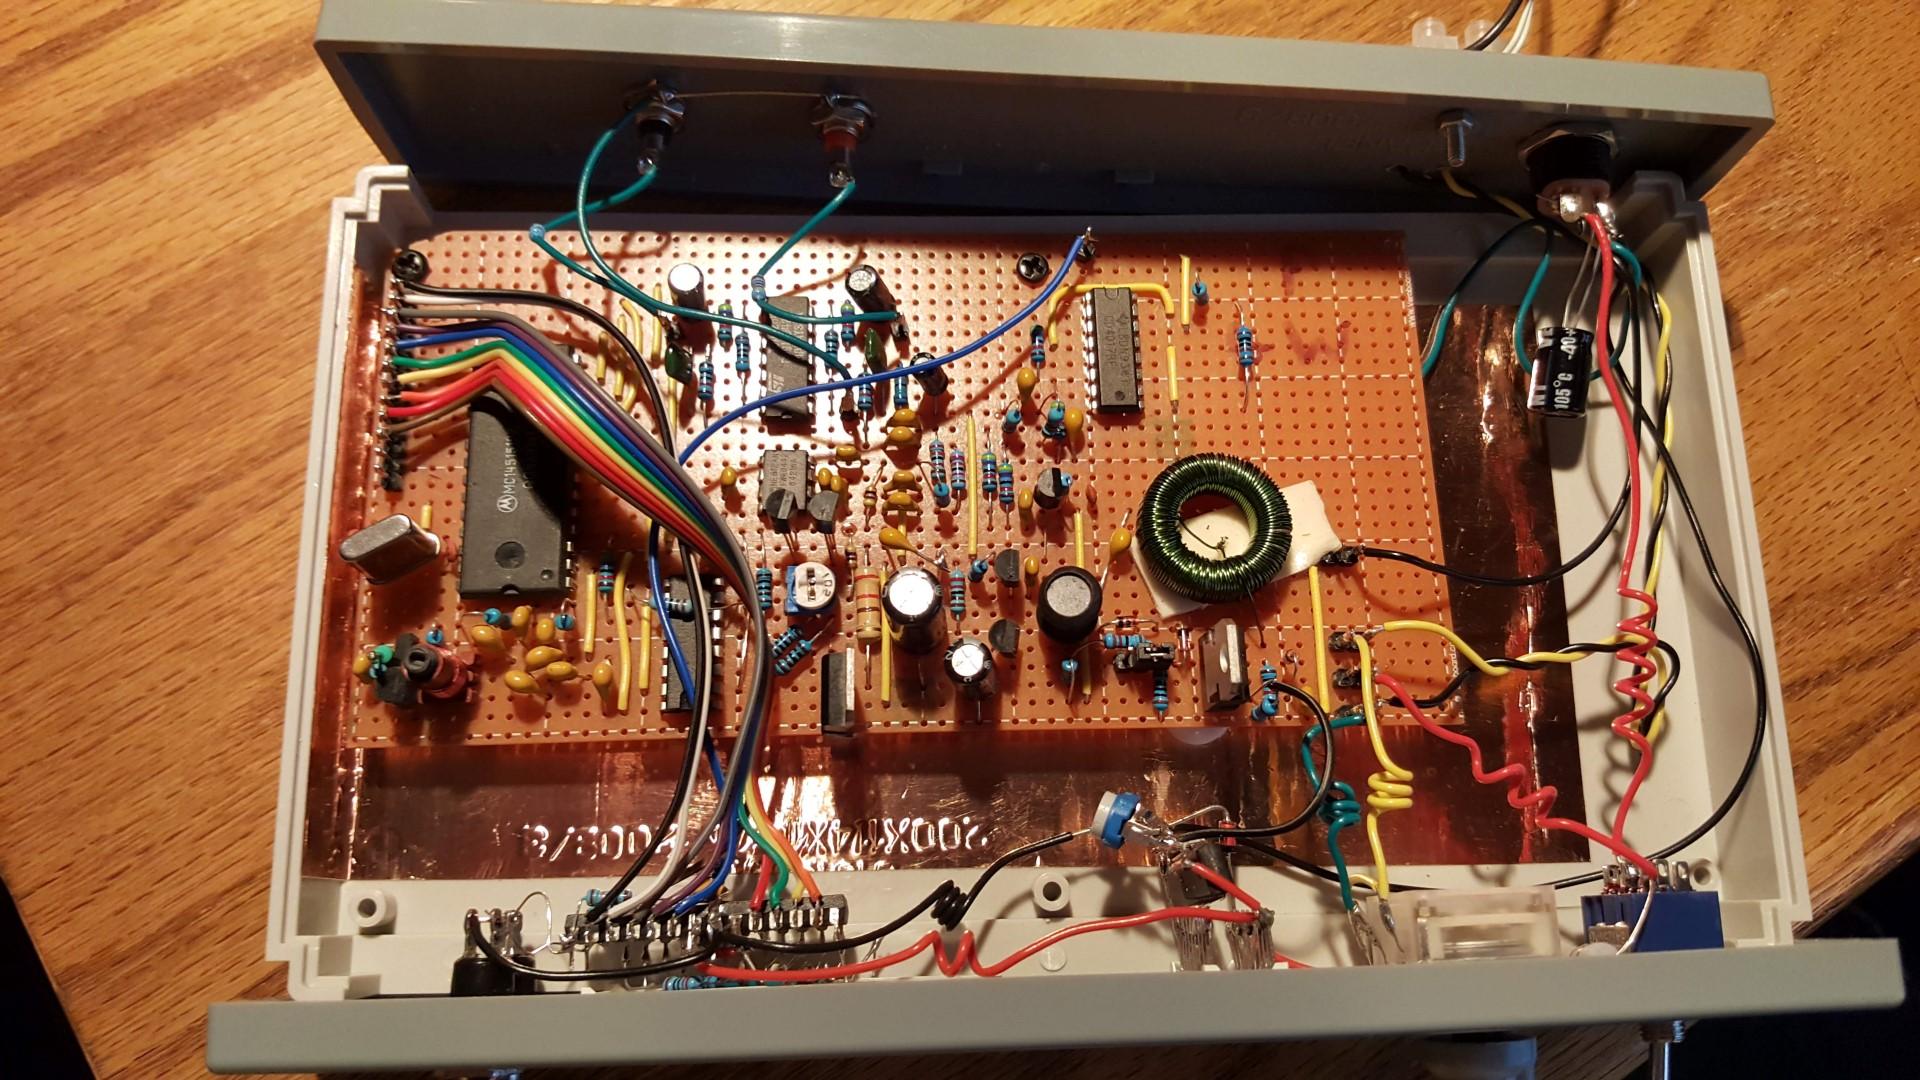 Cuthbert AM Stereo C-Quam Transmitter Kit | radiojayallen on